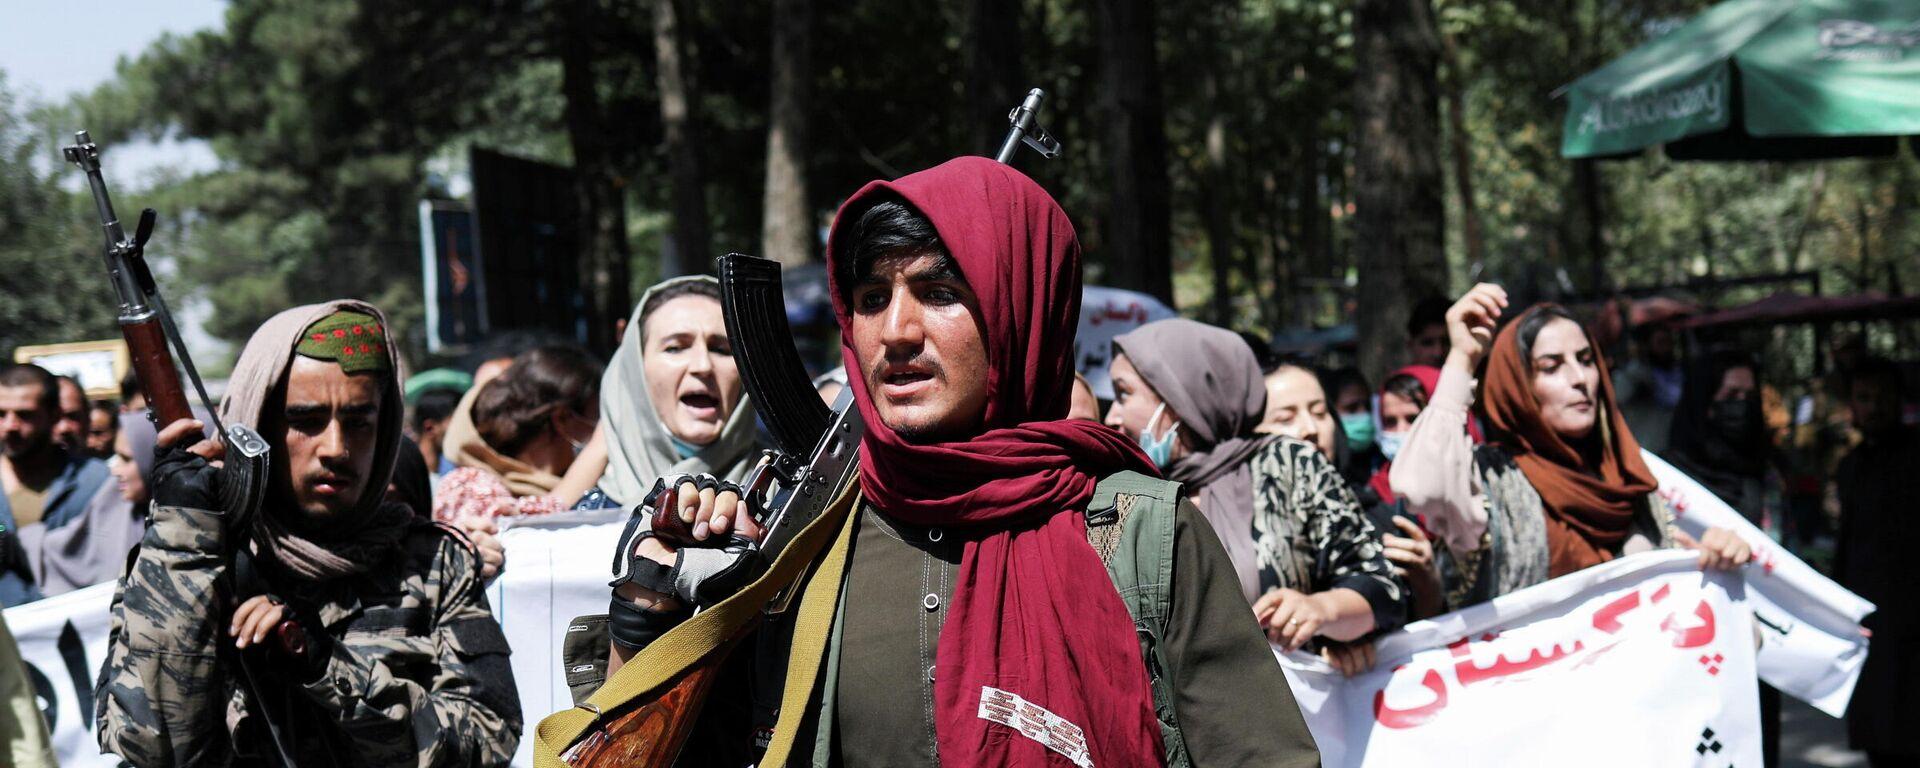 Солдаты Талибана идут перед протестующими во время антипакистанской акции протеста в Кабуле - Sputnik Тоҷикистон, 1920, 08.10.2021